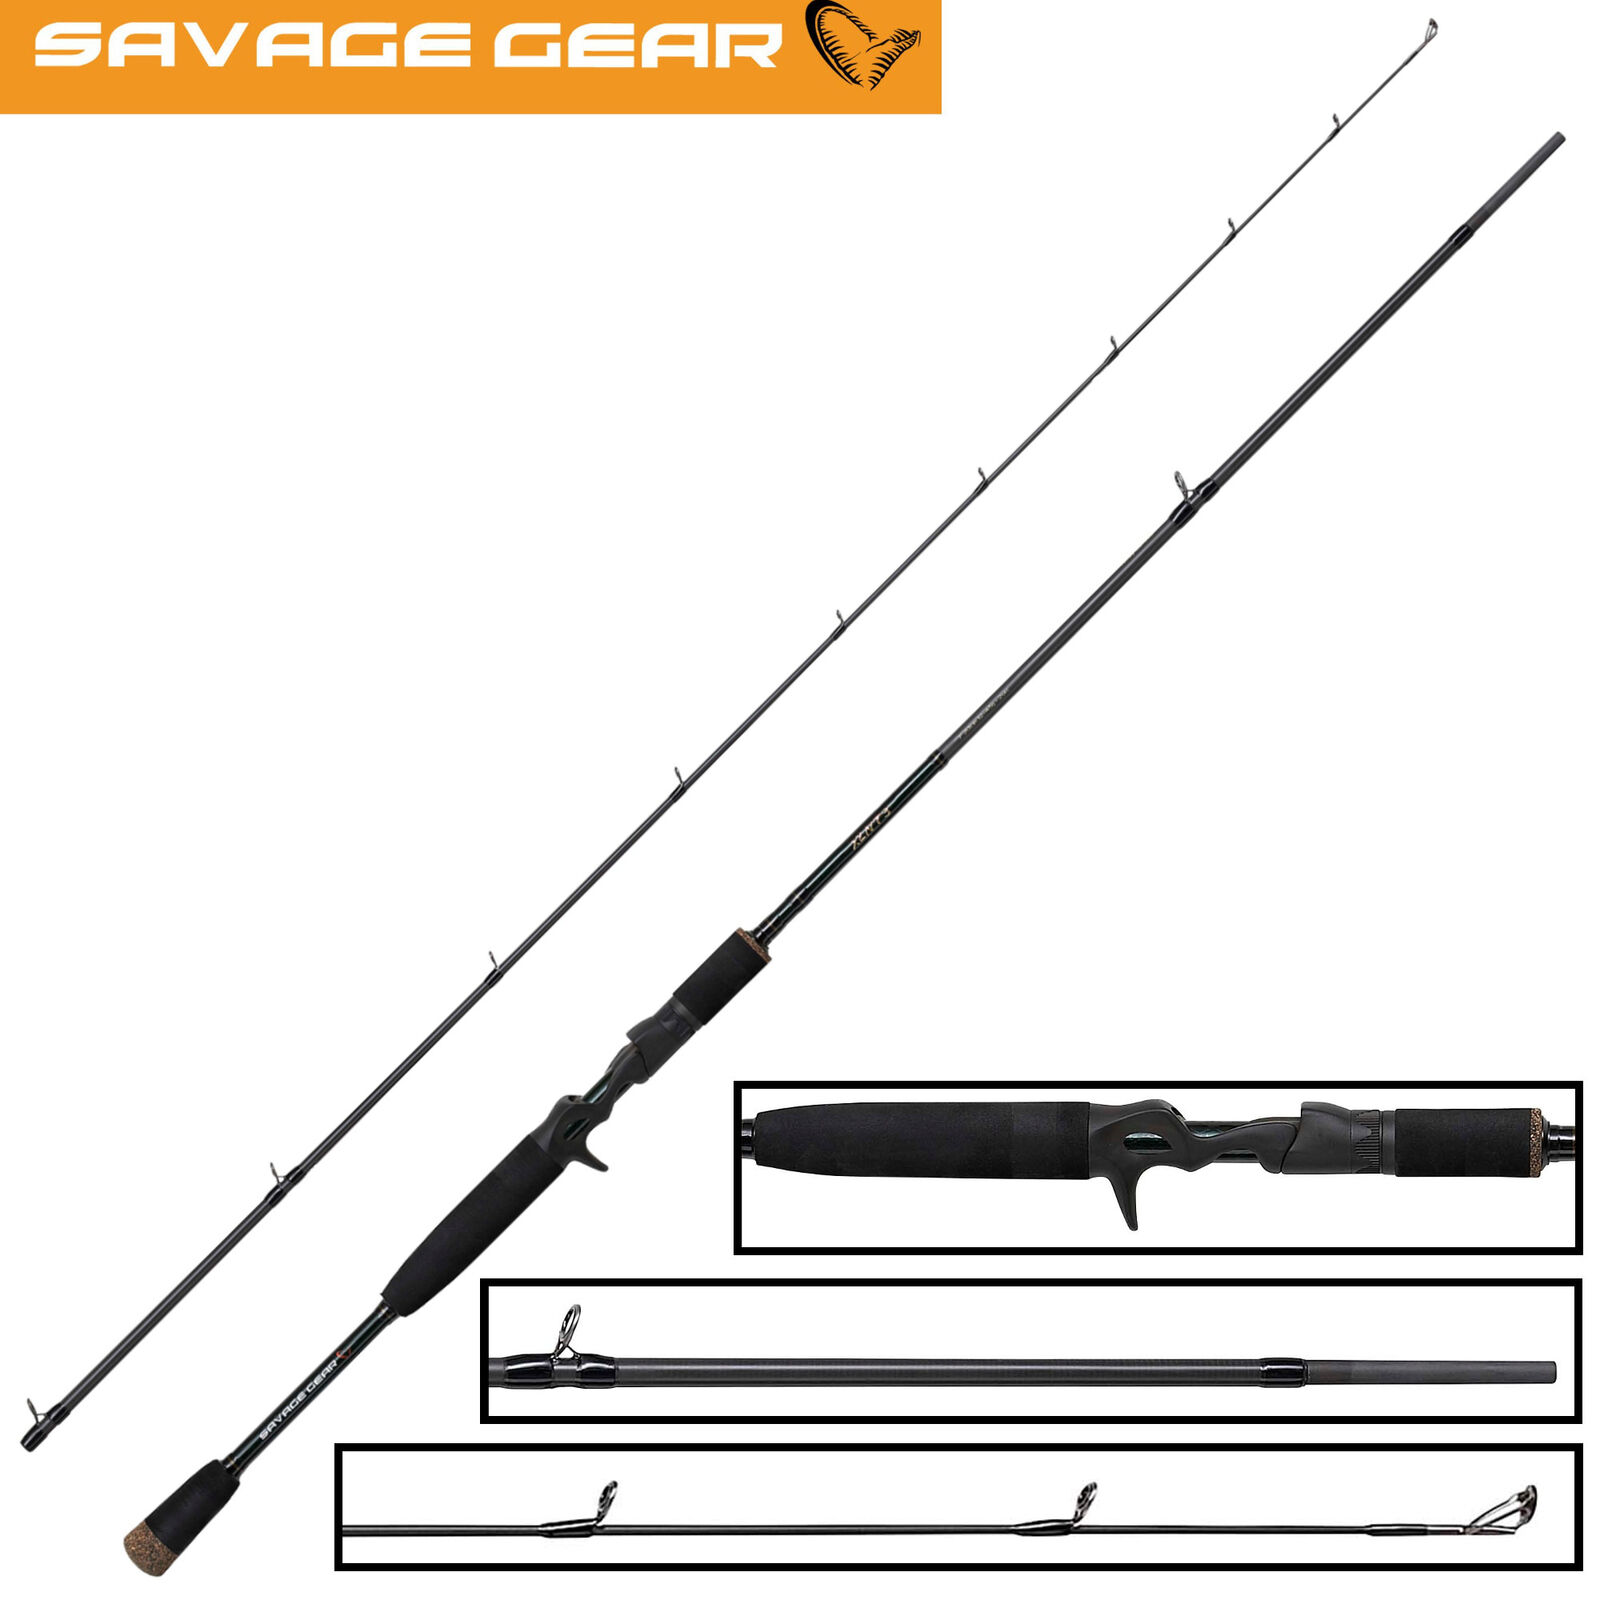 Savage Gear XLNT3 Trigger 2 2 2 13m 12-45g - Spinnrute Jigrute Zanderrute dfb41e